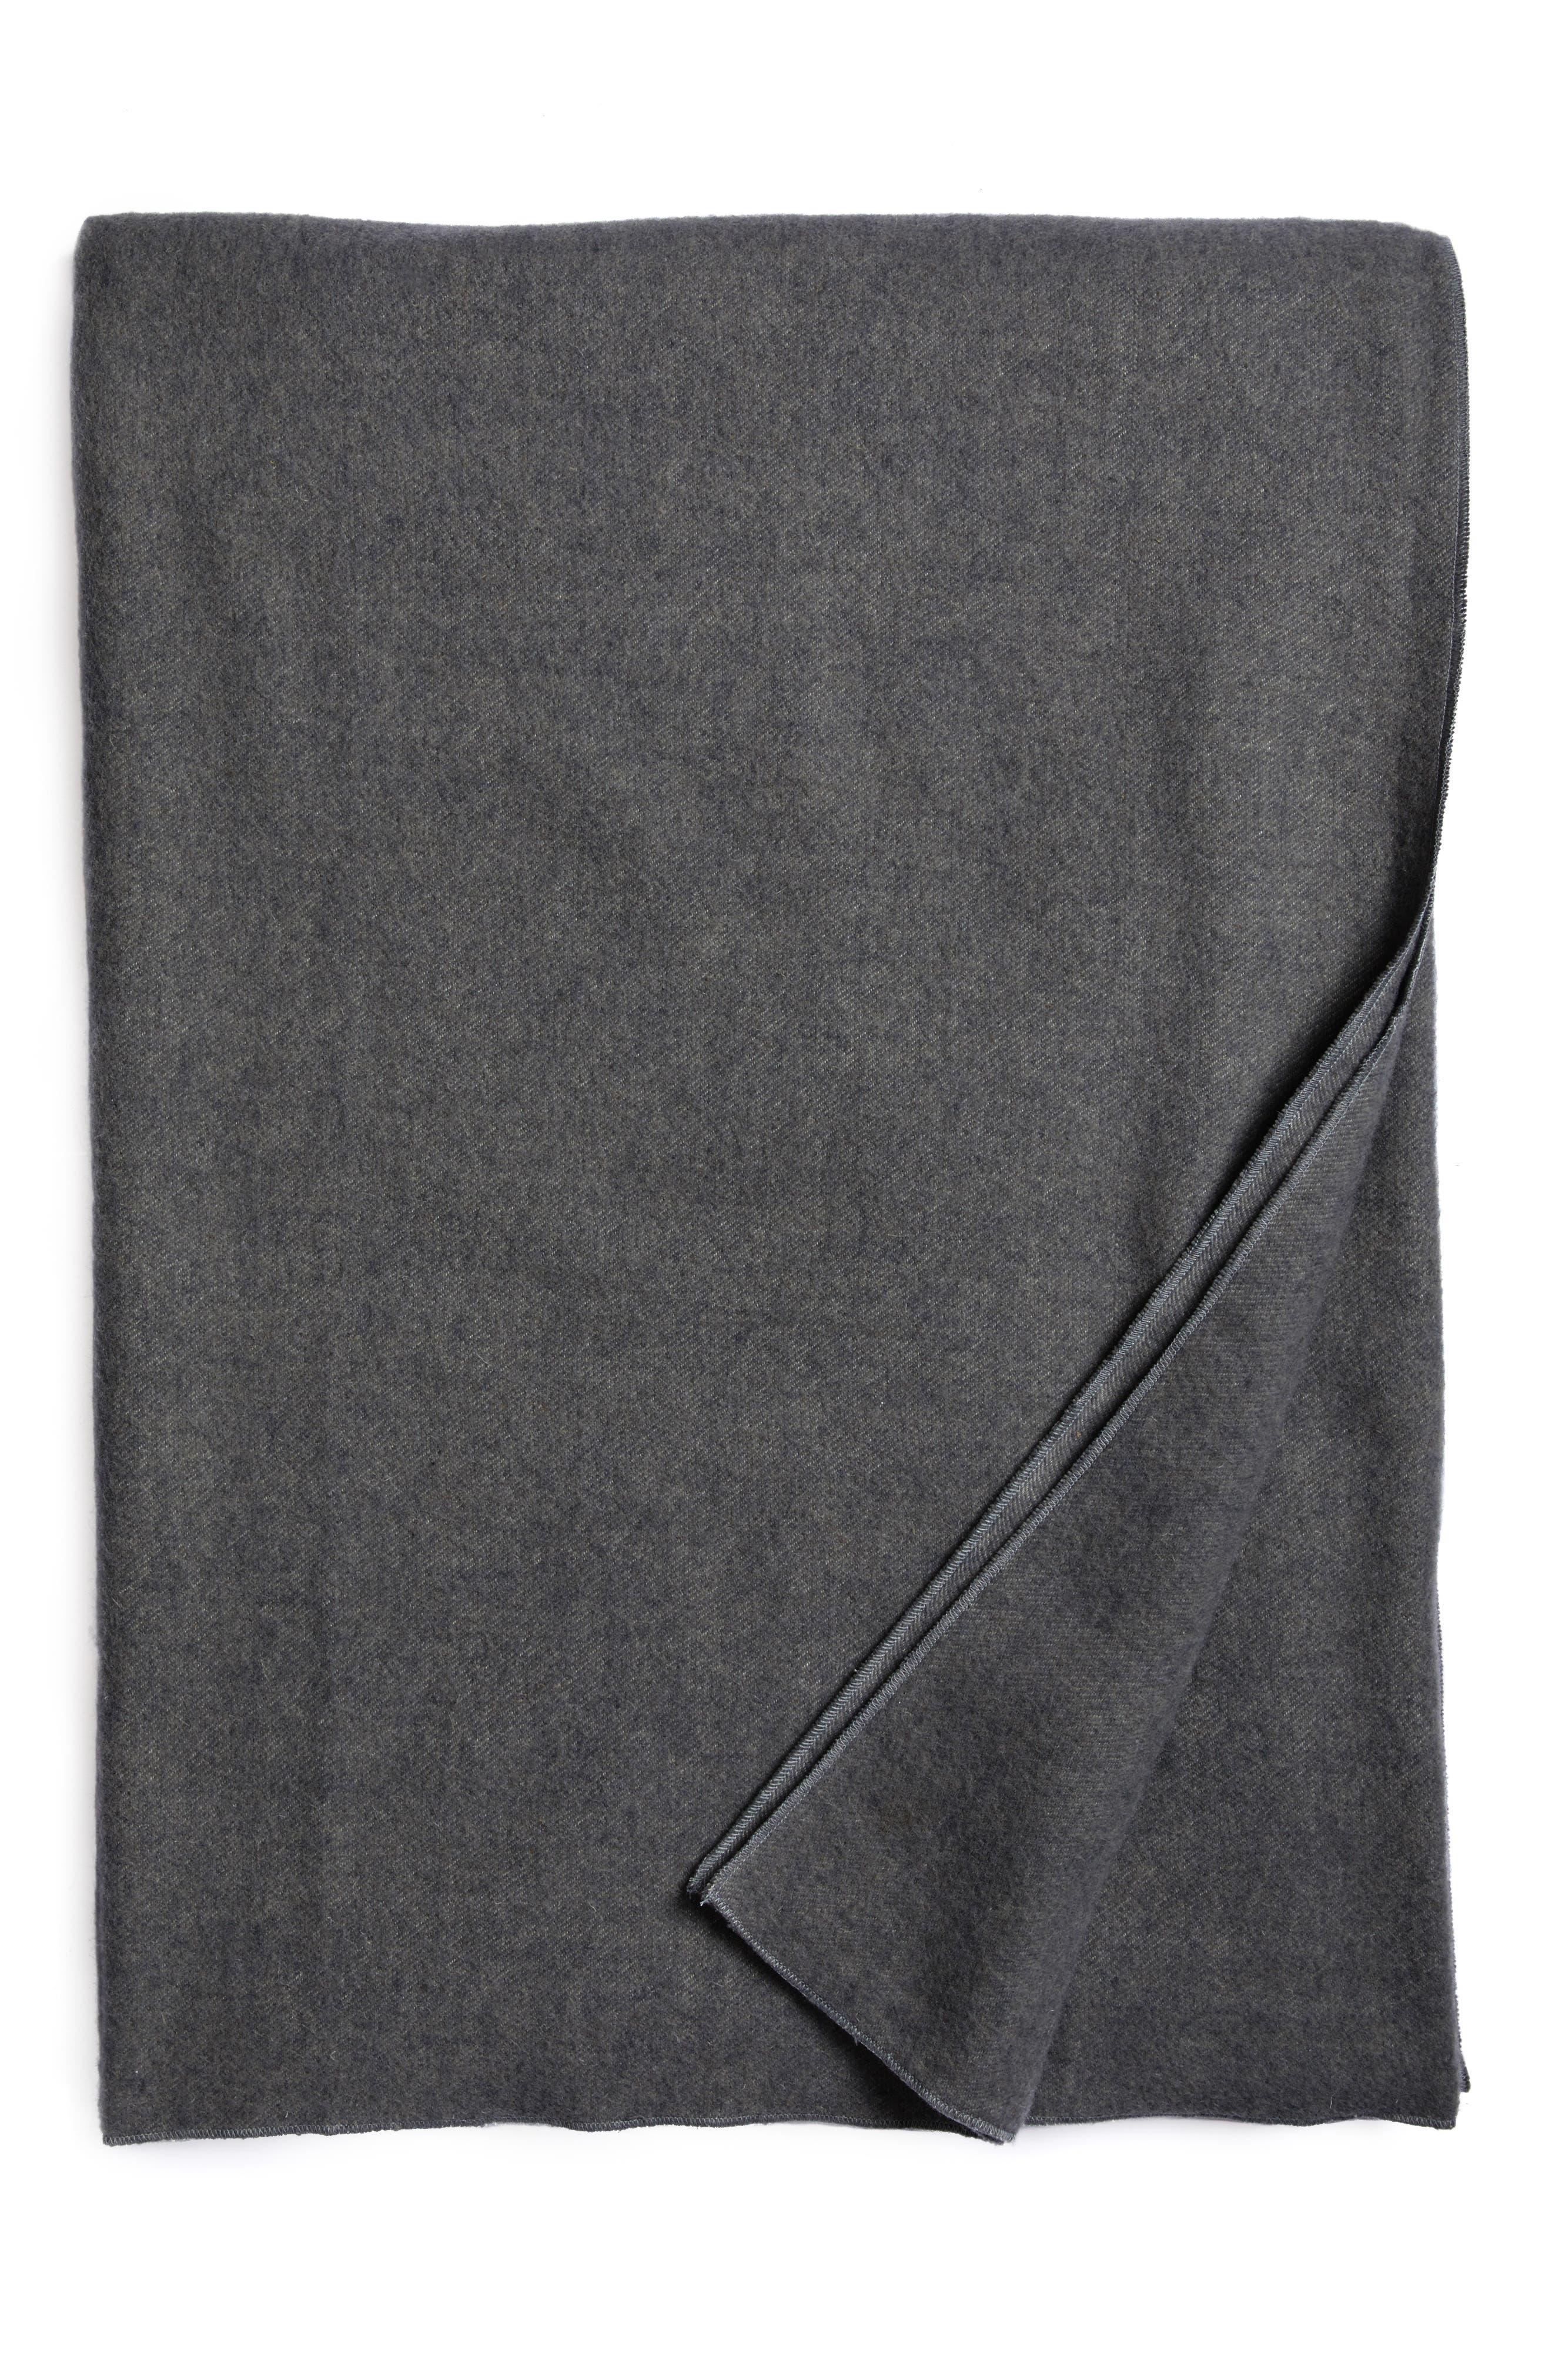 Series 1 Wool Blanket,                         Main,                         color, Charcoal